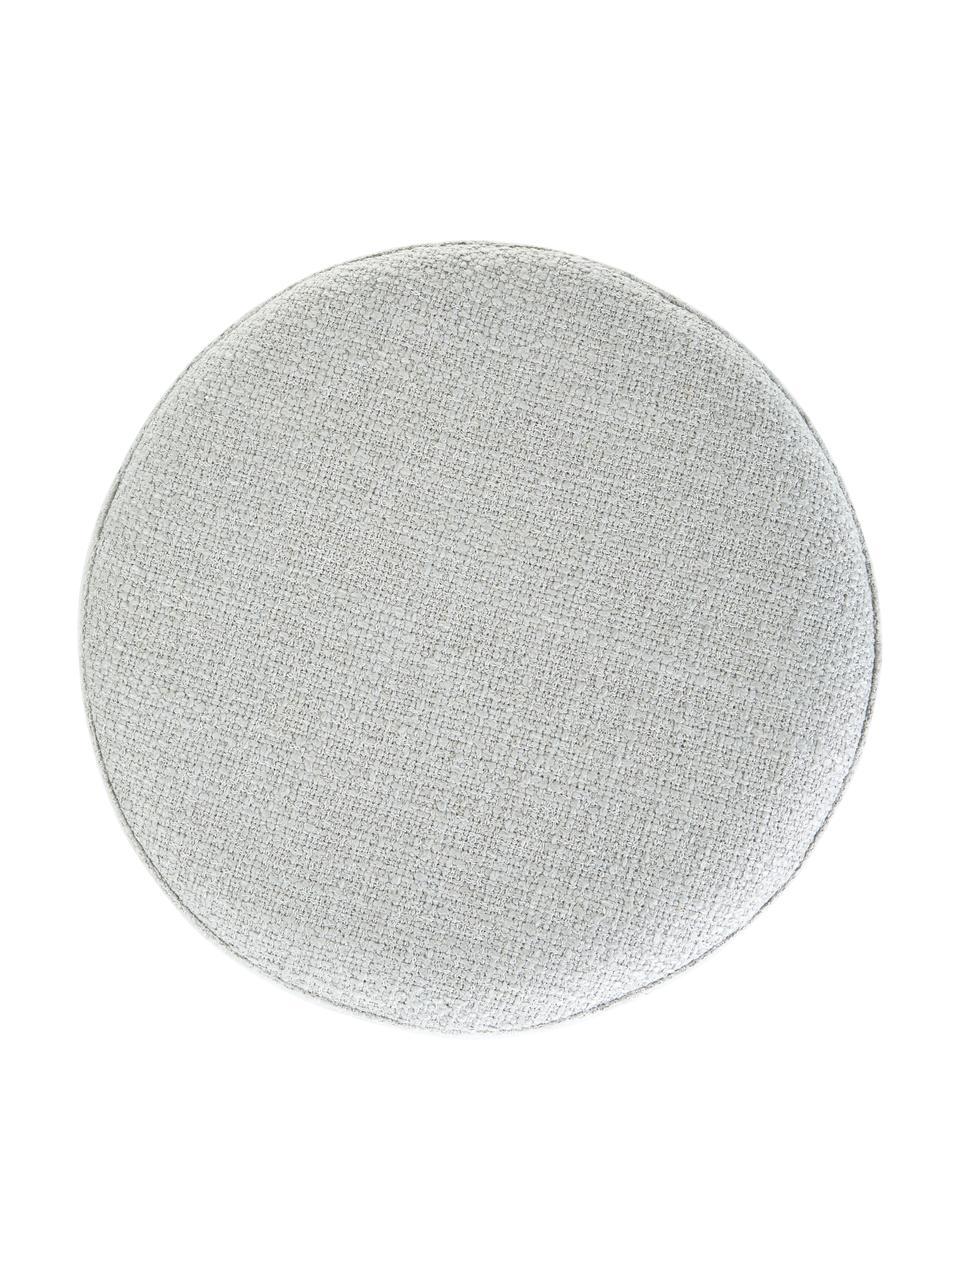 Pouf in bouclé grigio chiaro Orchid, Rivestimento: Bouclé (70% poliestere, 2, Cornice: compensato, Piedini: metallo verniciato a polv, Bouclé grigio chiaro, nero, Ø 38 x Alt. 38 cm